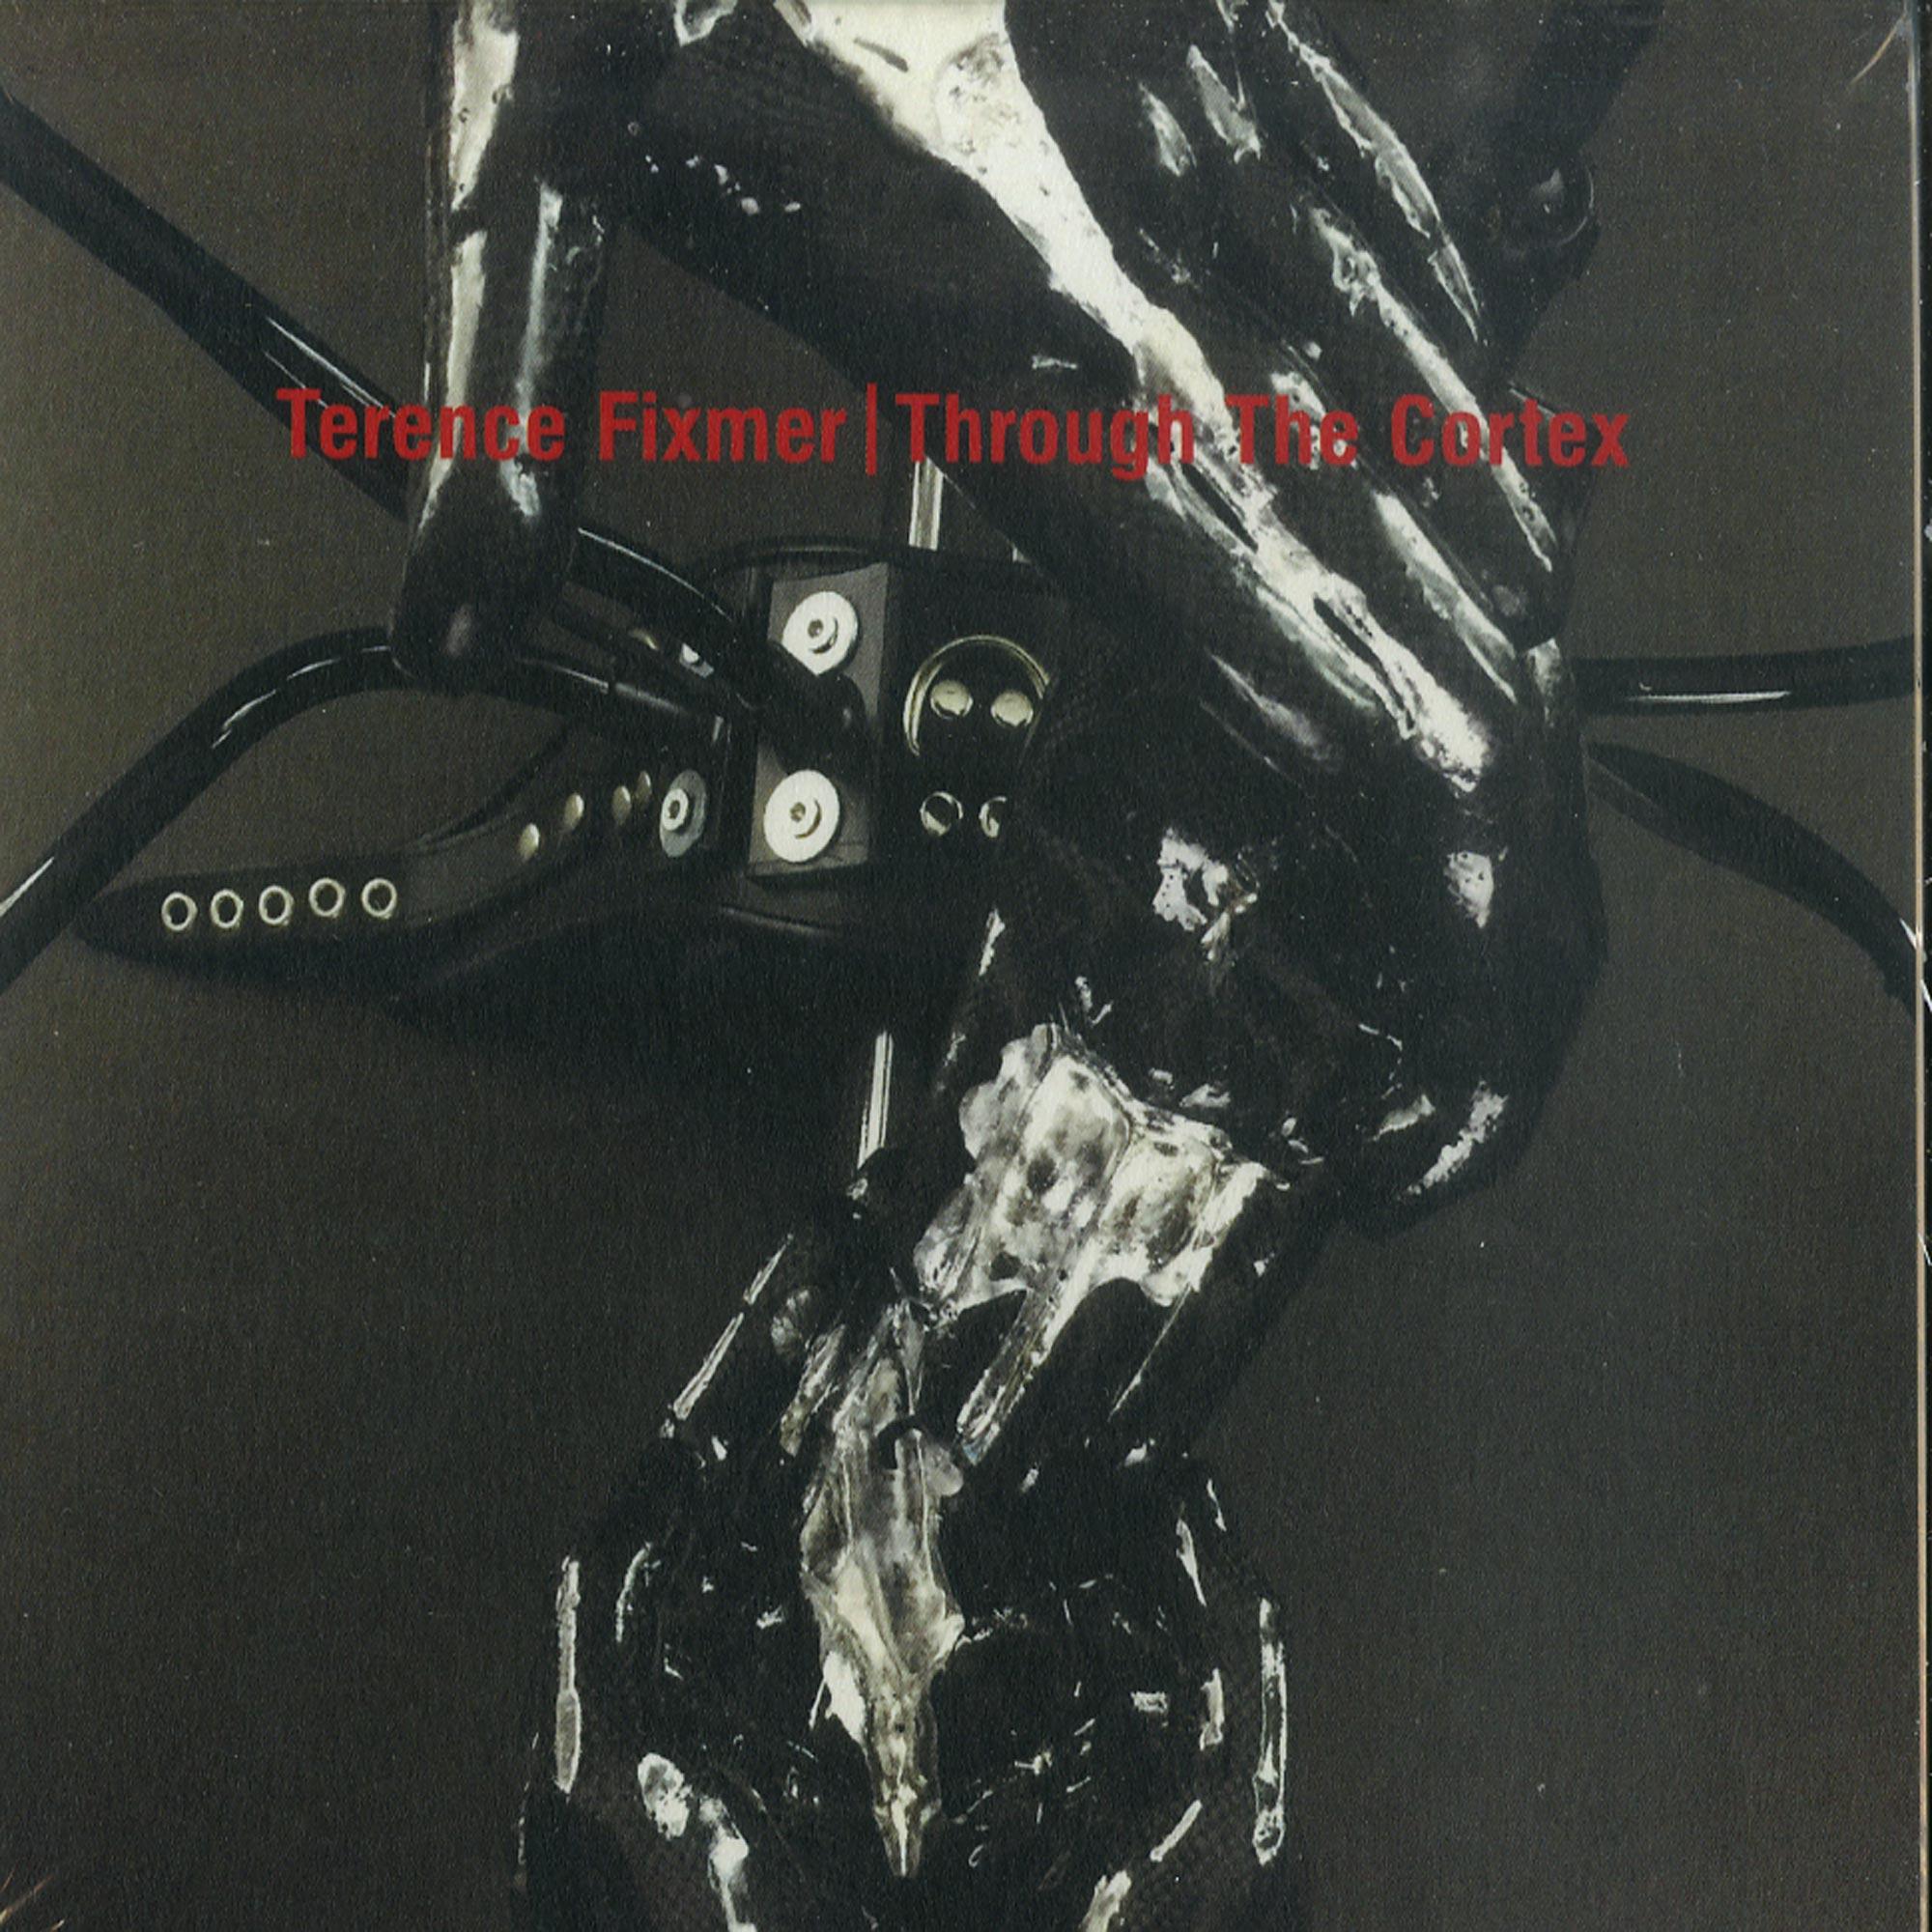 Terence Fixmer - THROUGH THE CORTEX